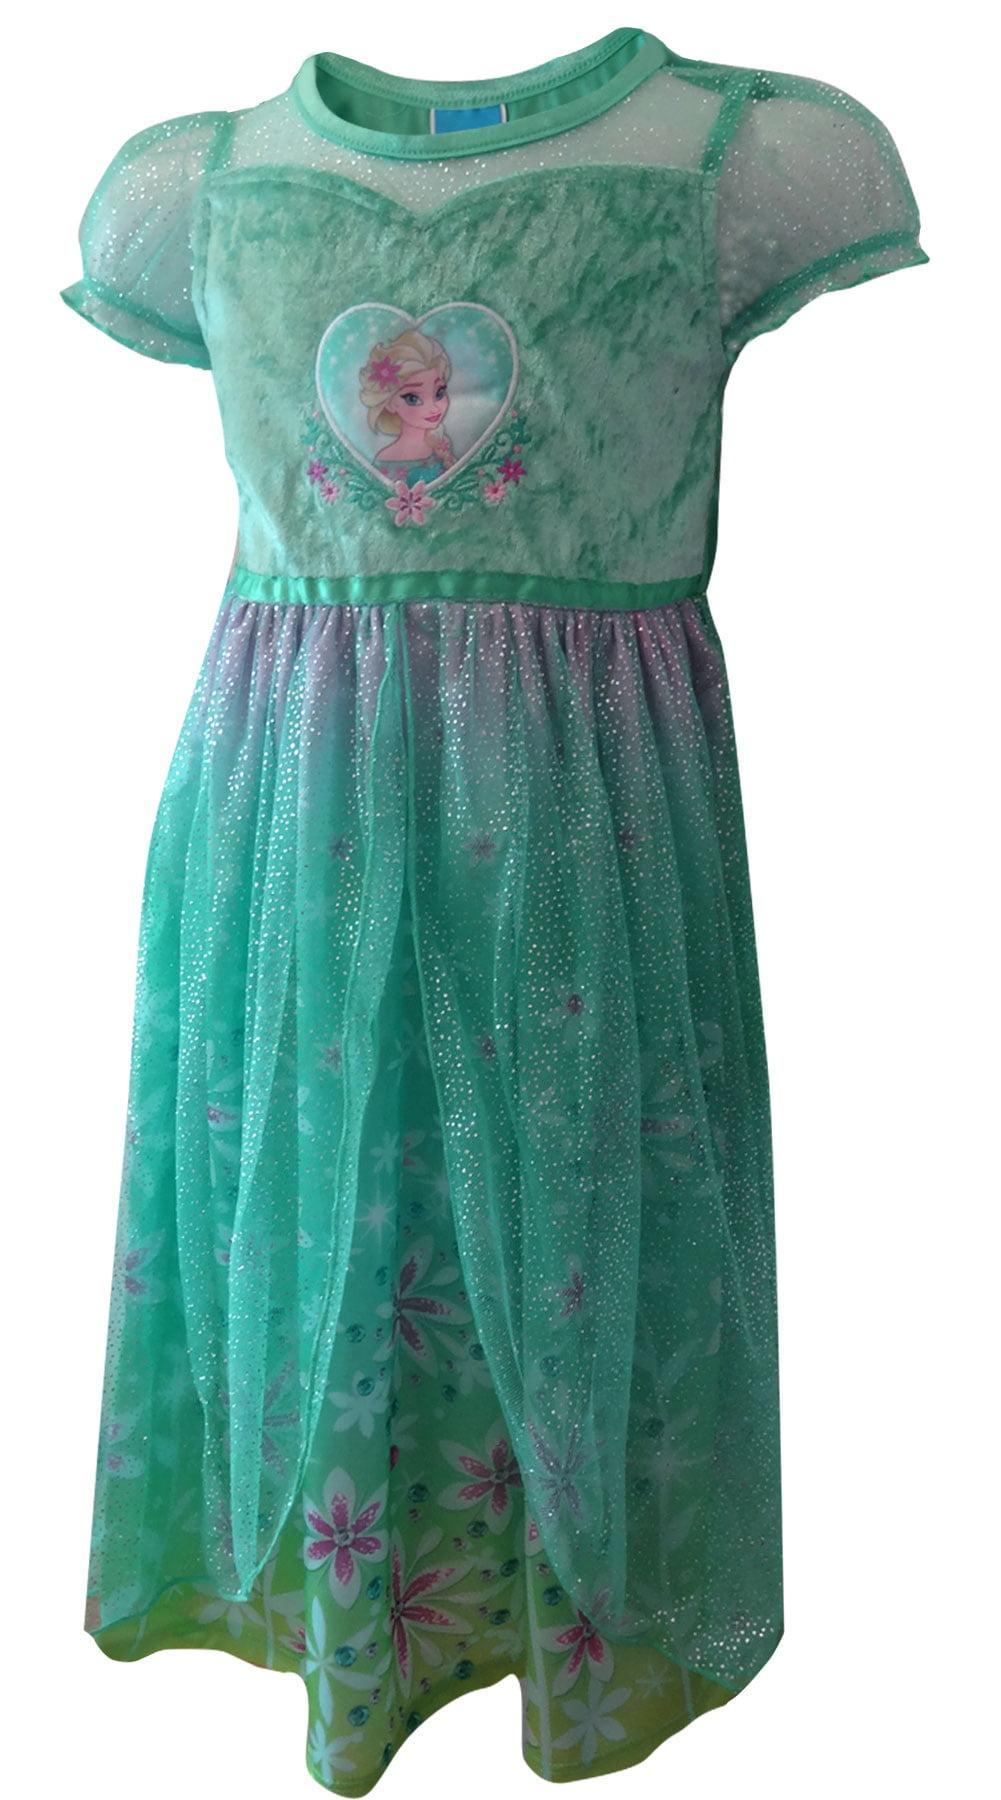 Disney Frozen Princess Elsa Frozen Fever Toddler Nightgown - Walmart.com